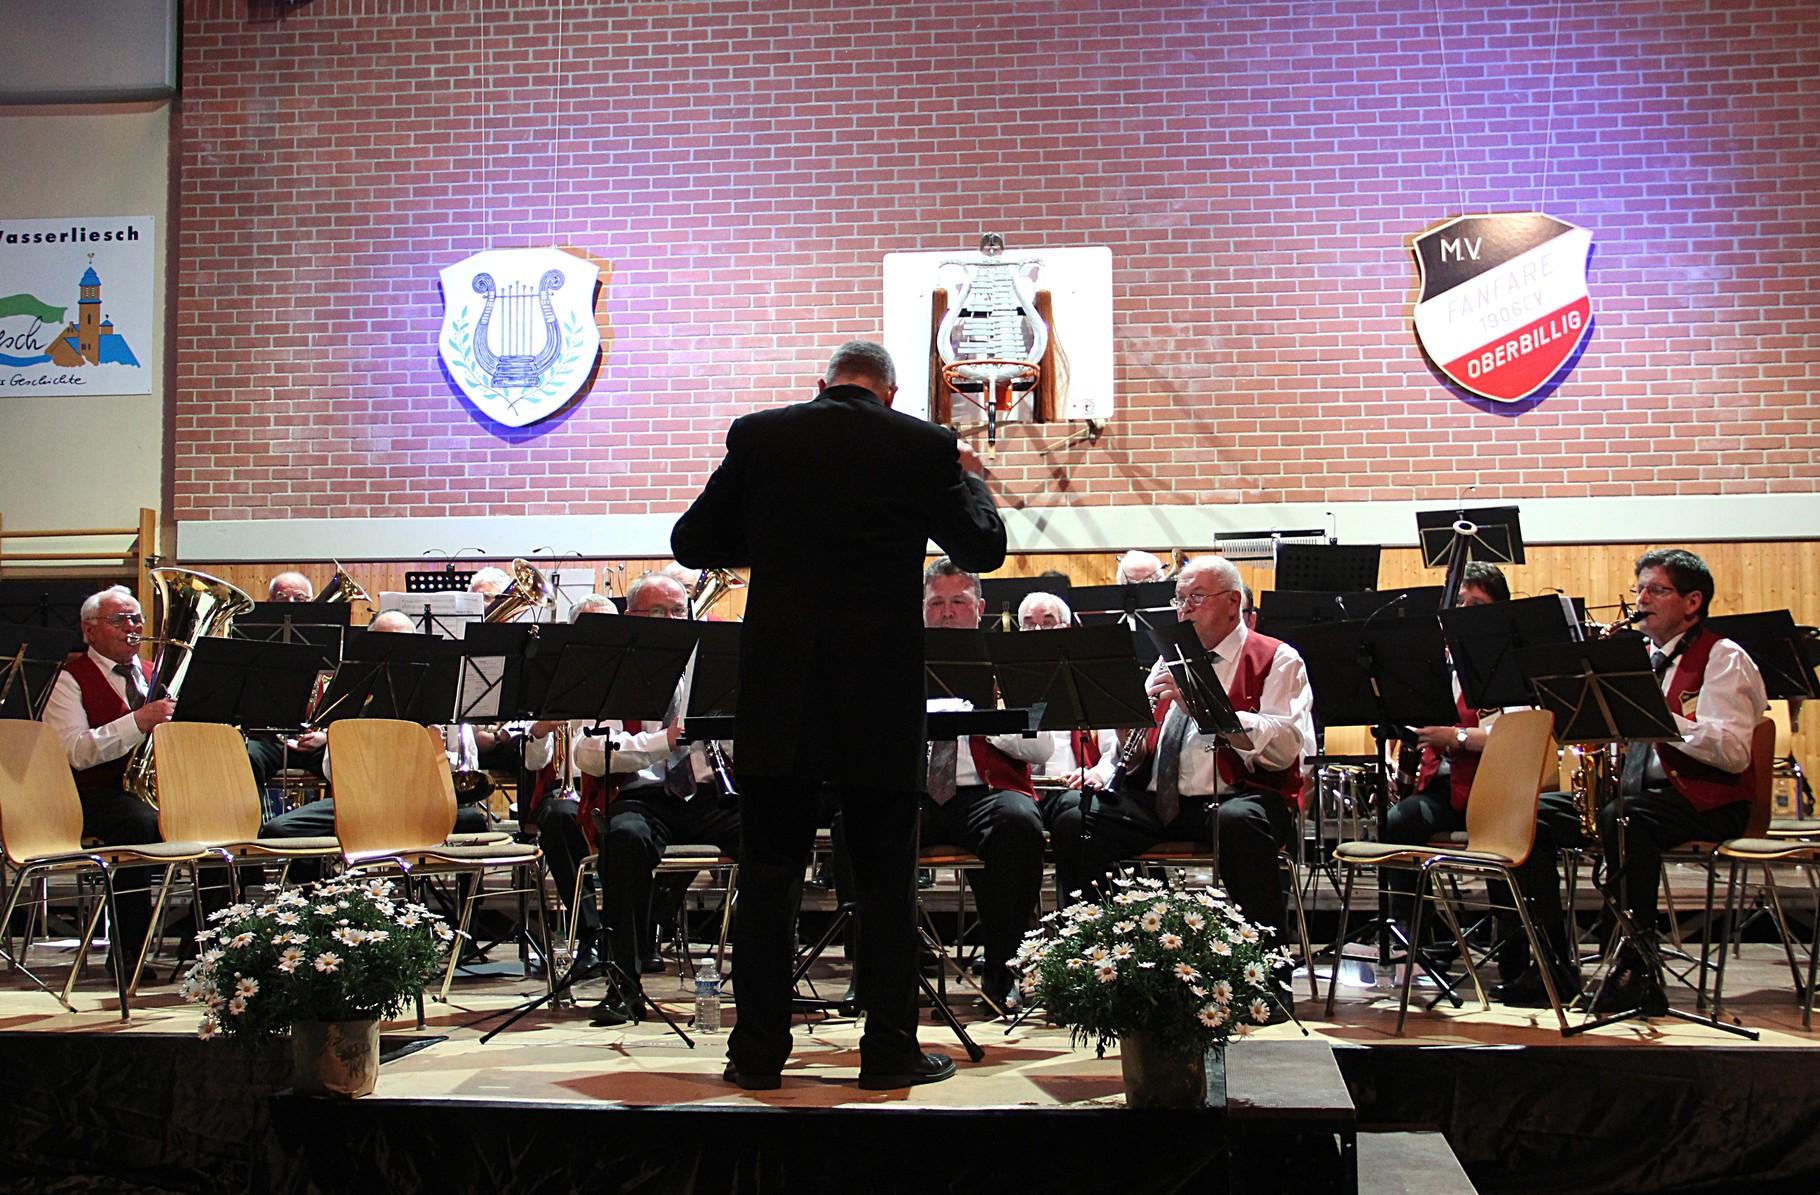 Ü-50 Orchester